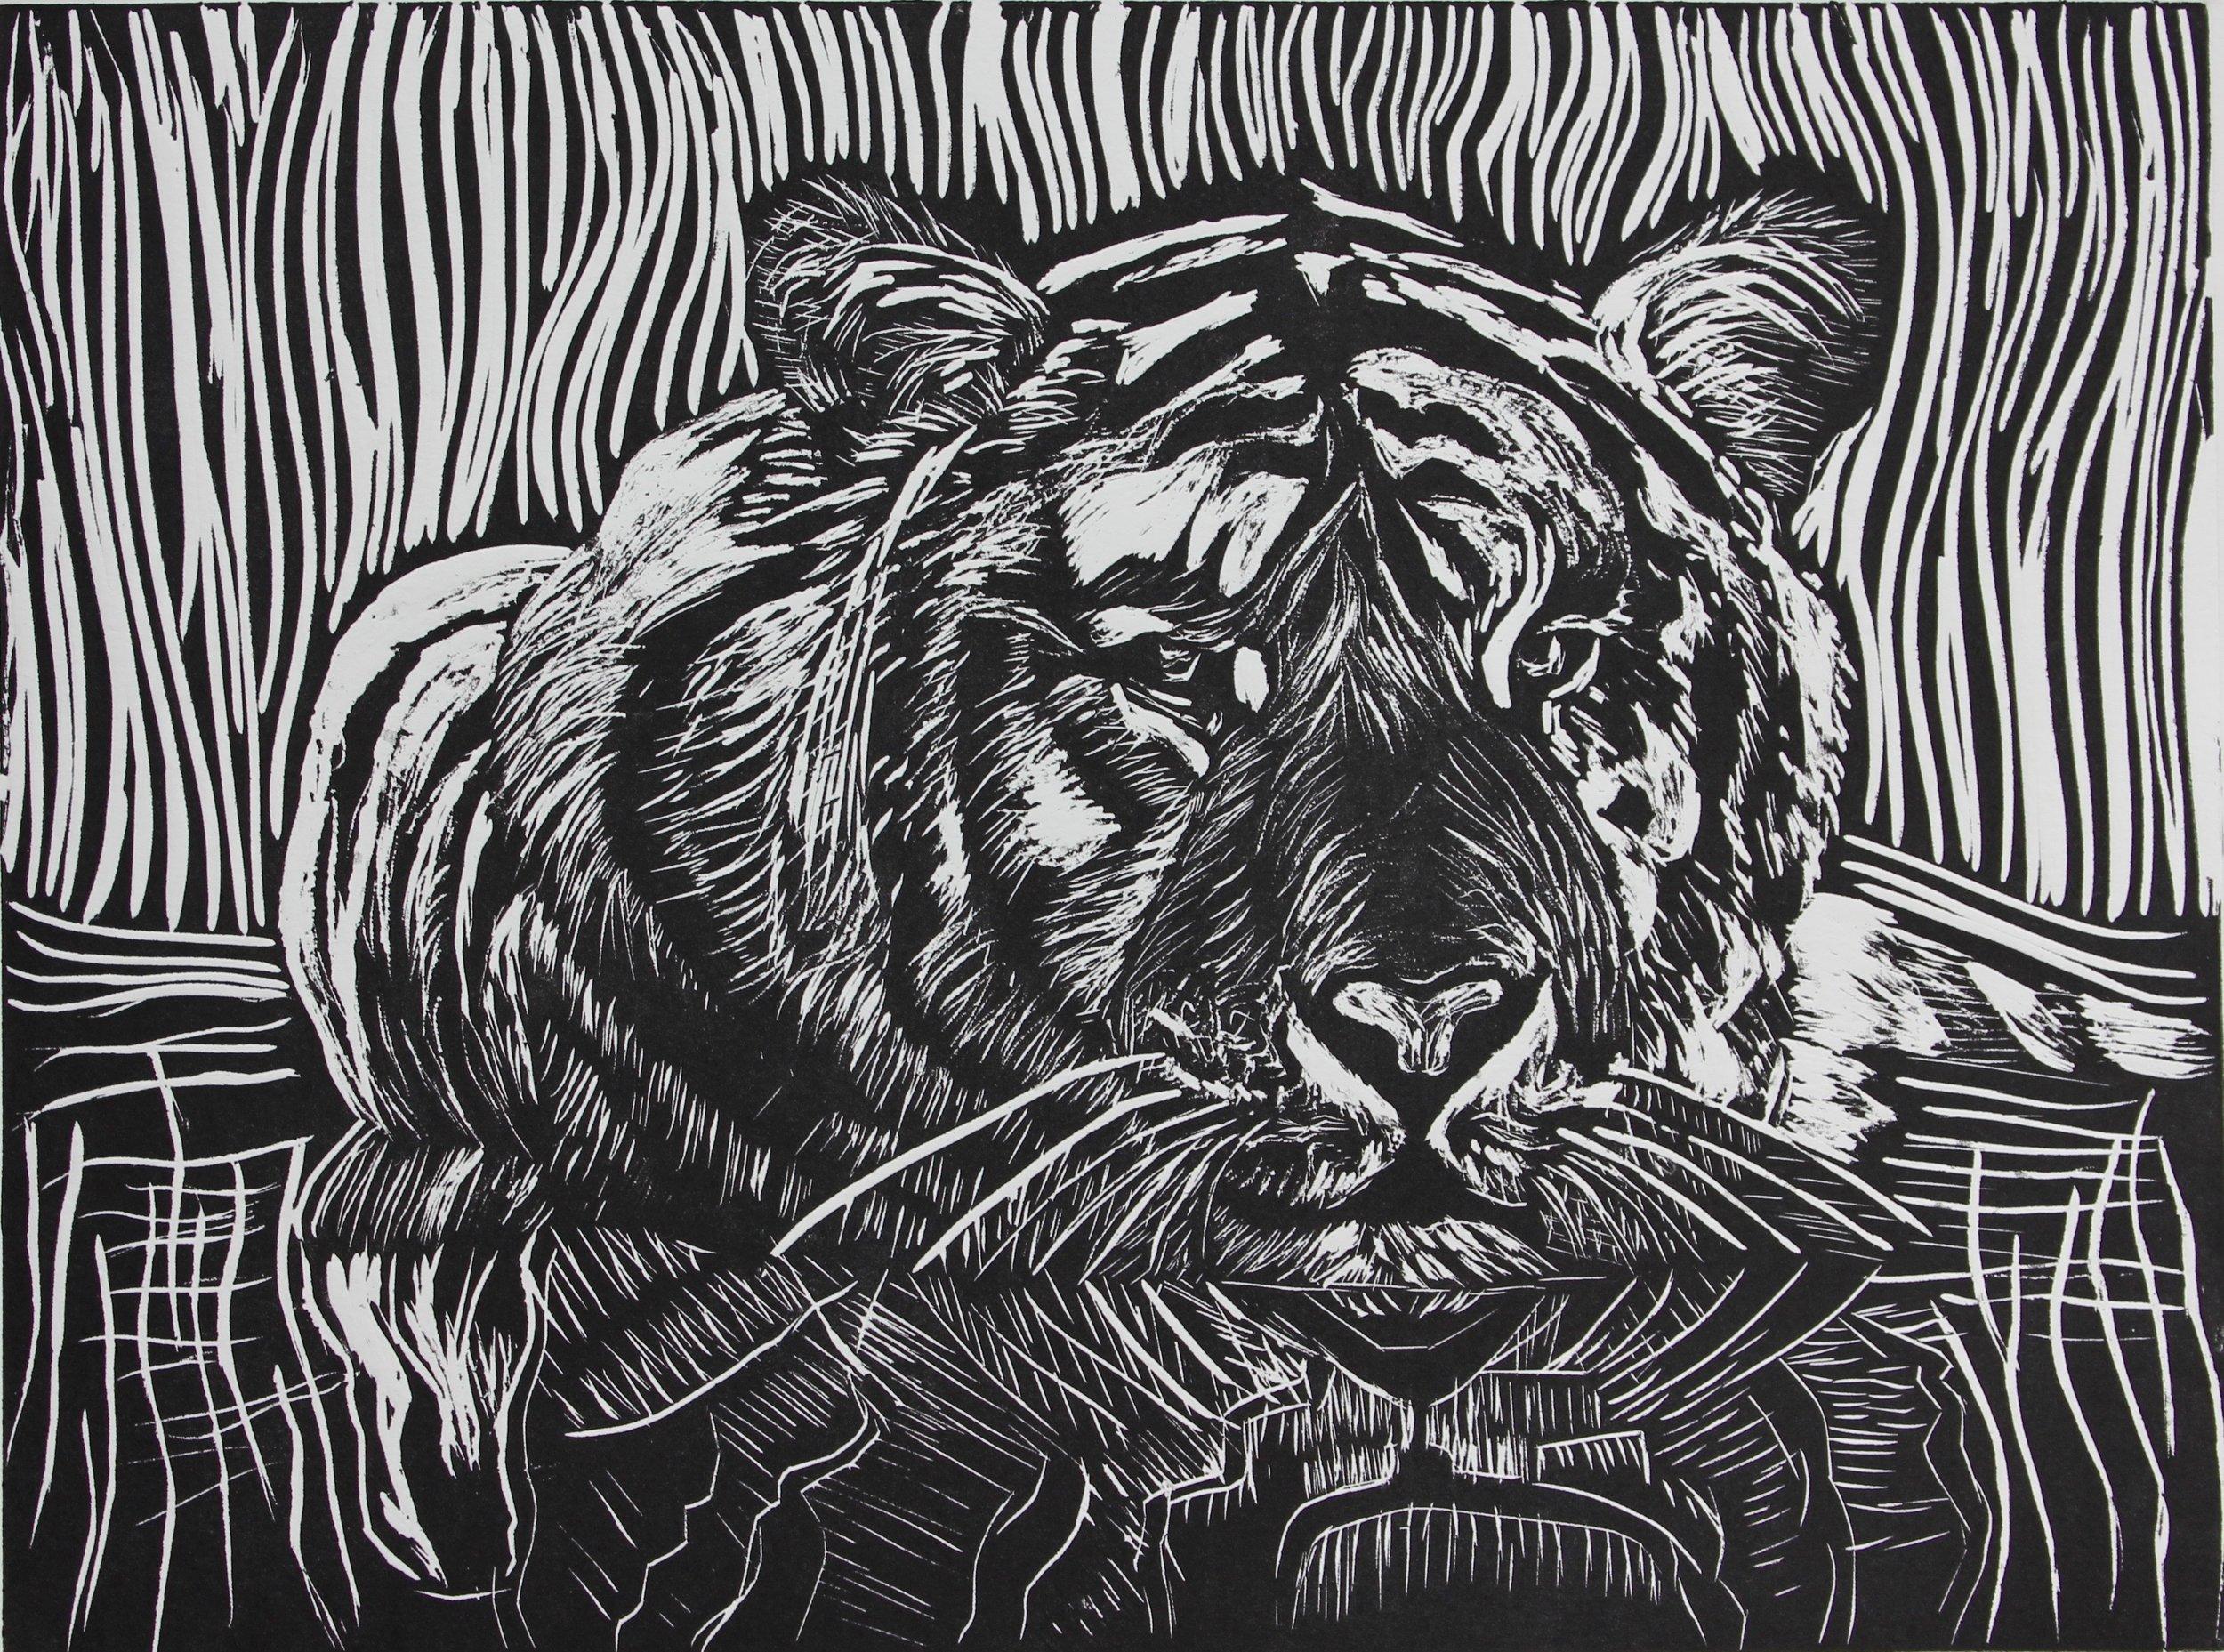 Tiger Too!